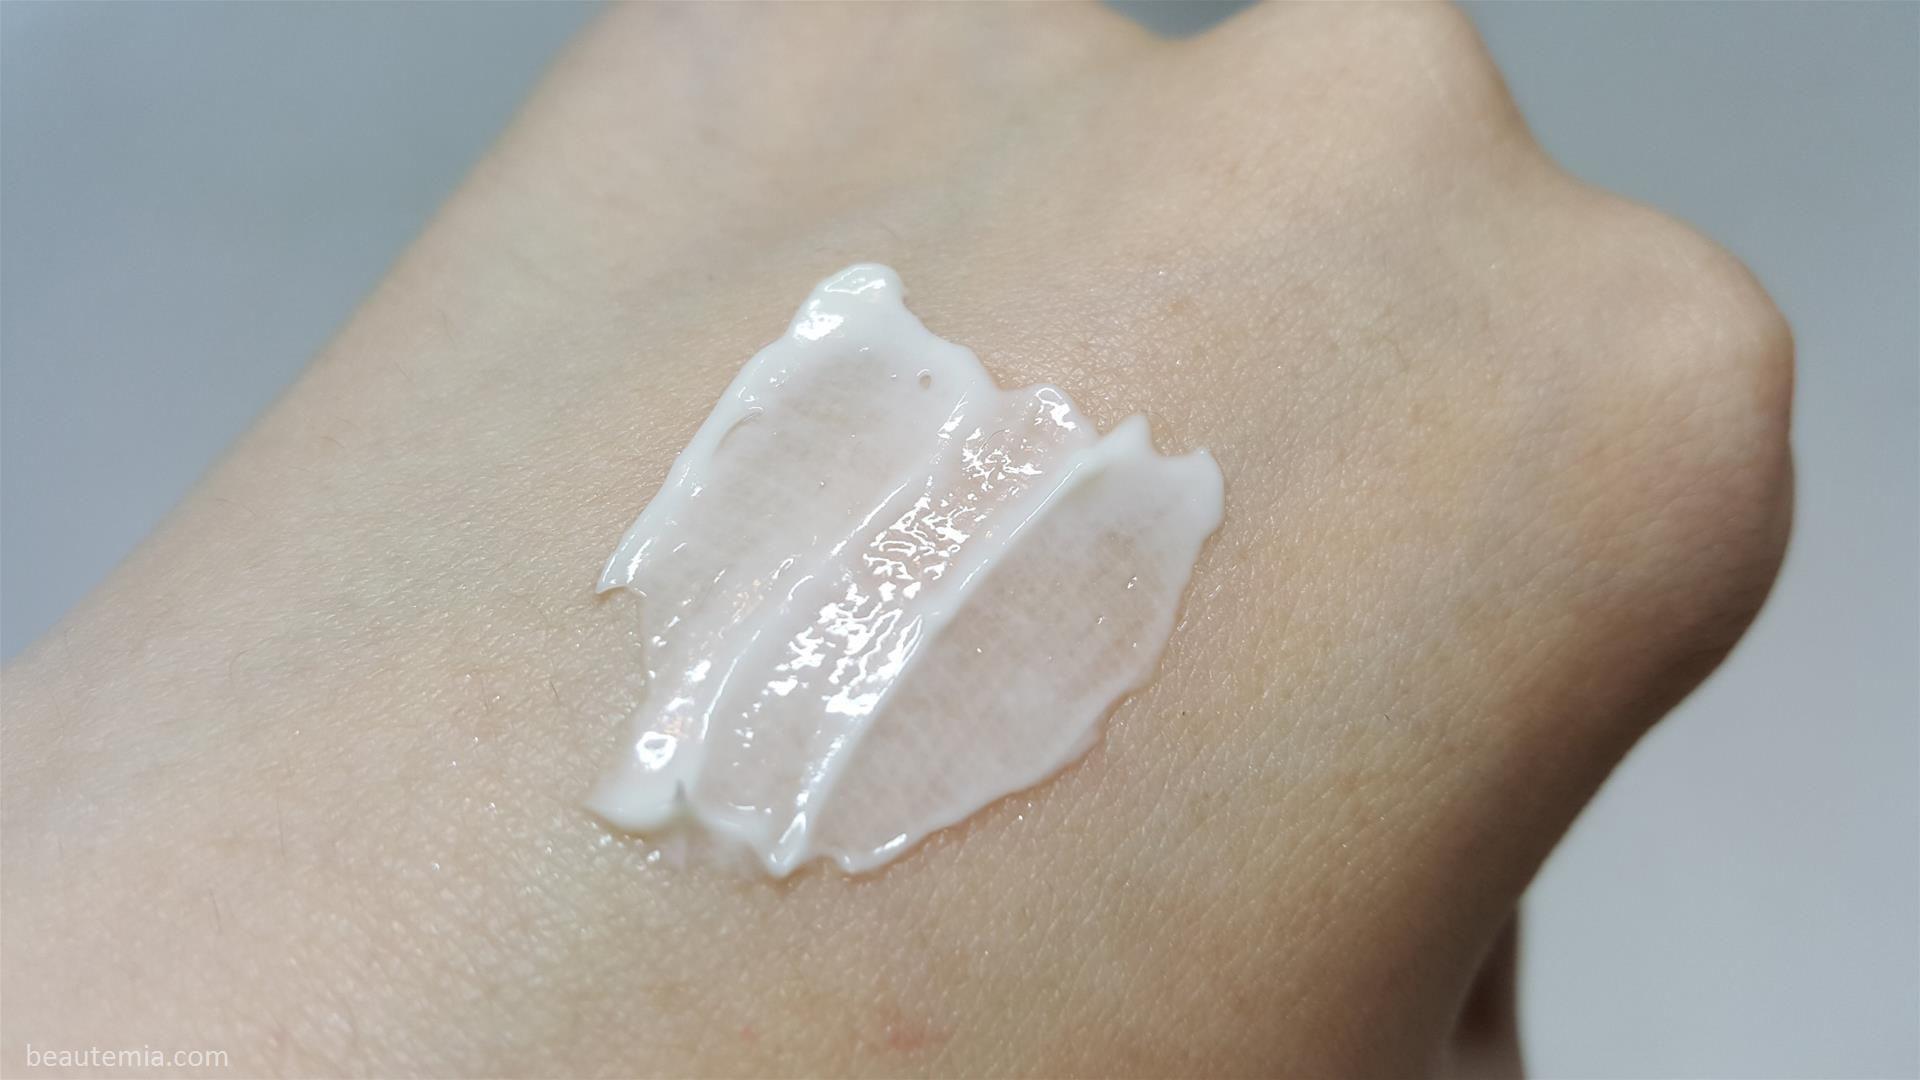 Pin on Salon Skincare